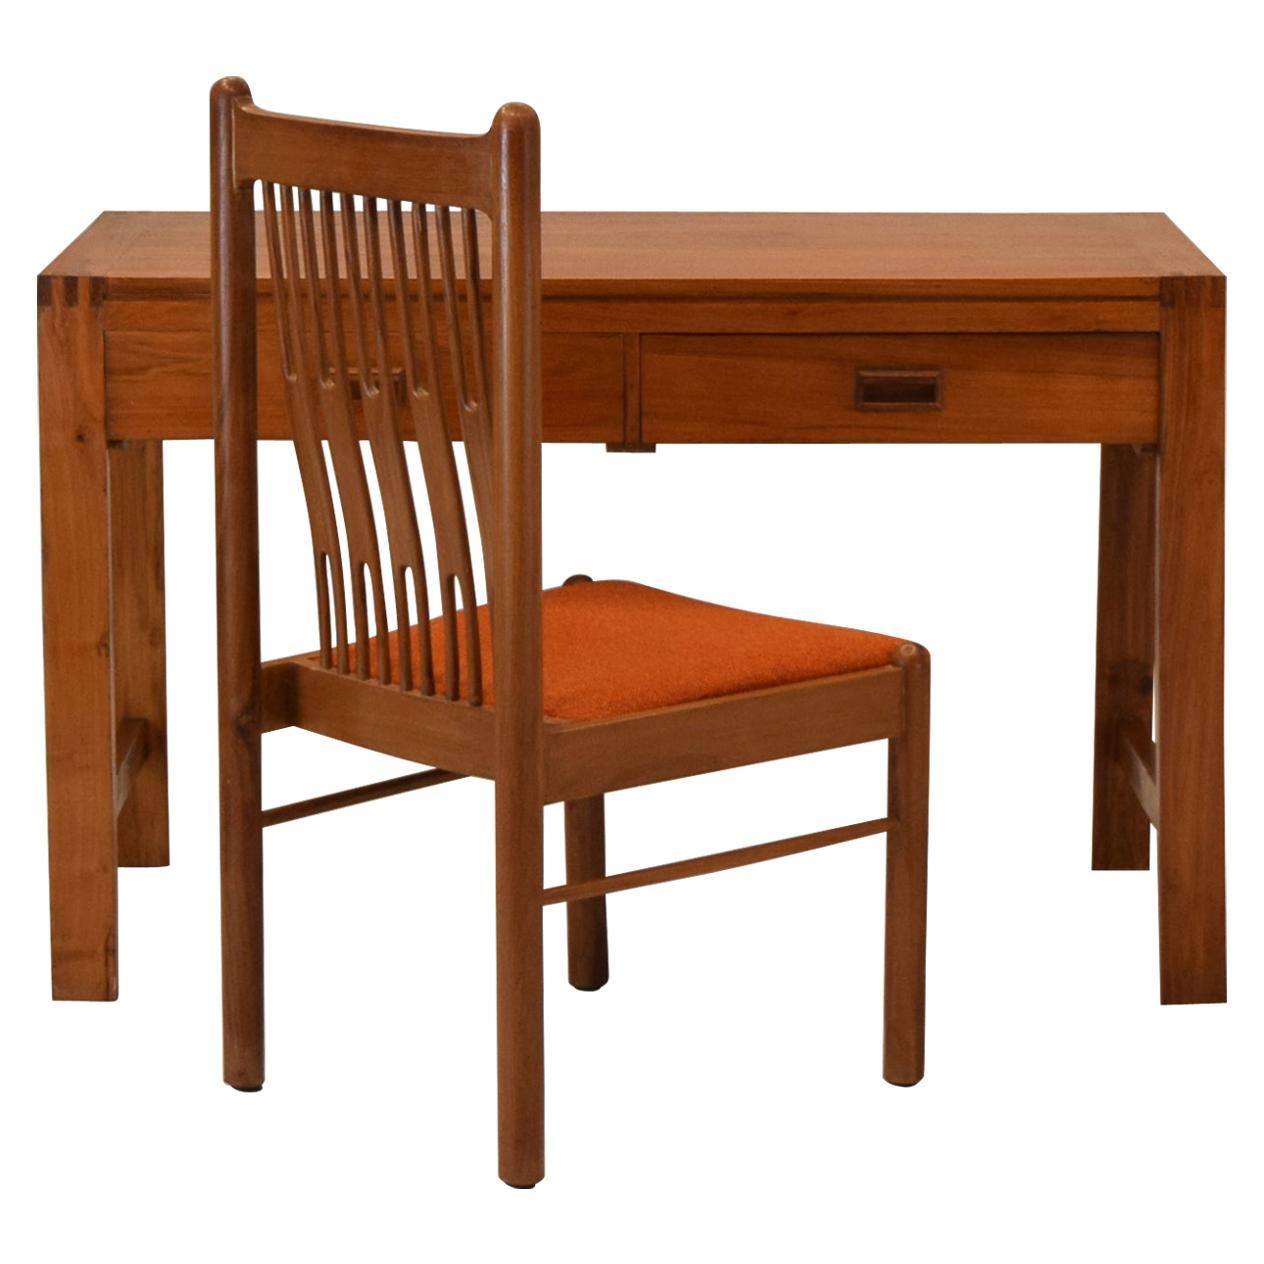 Custom Danish Desk and Chair